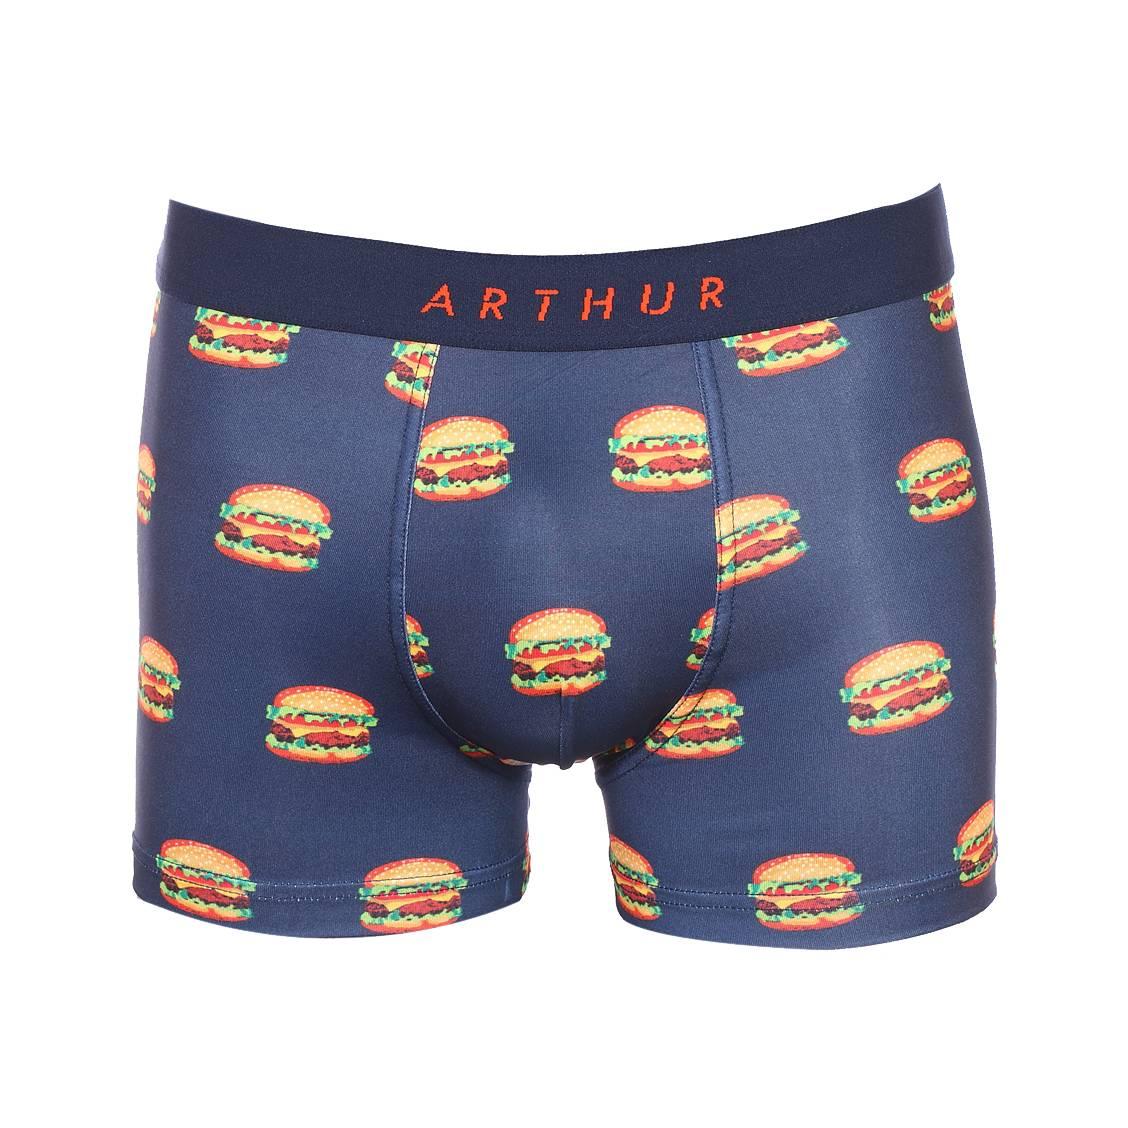 Boxer  macburger en coton stretch bleu marine à motifs burgers